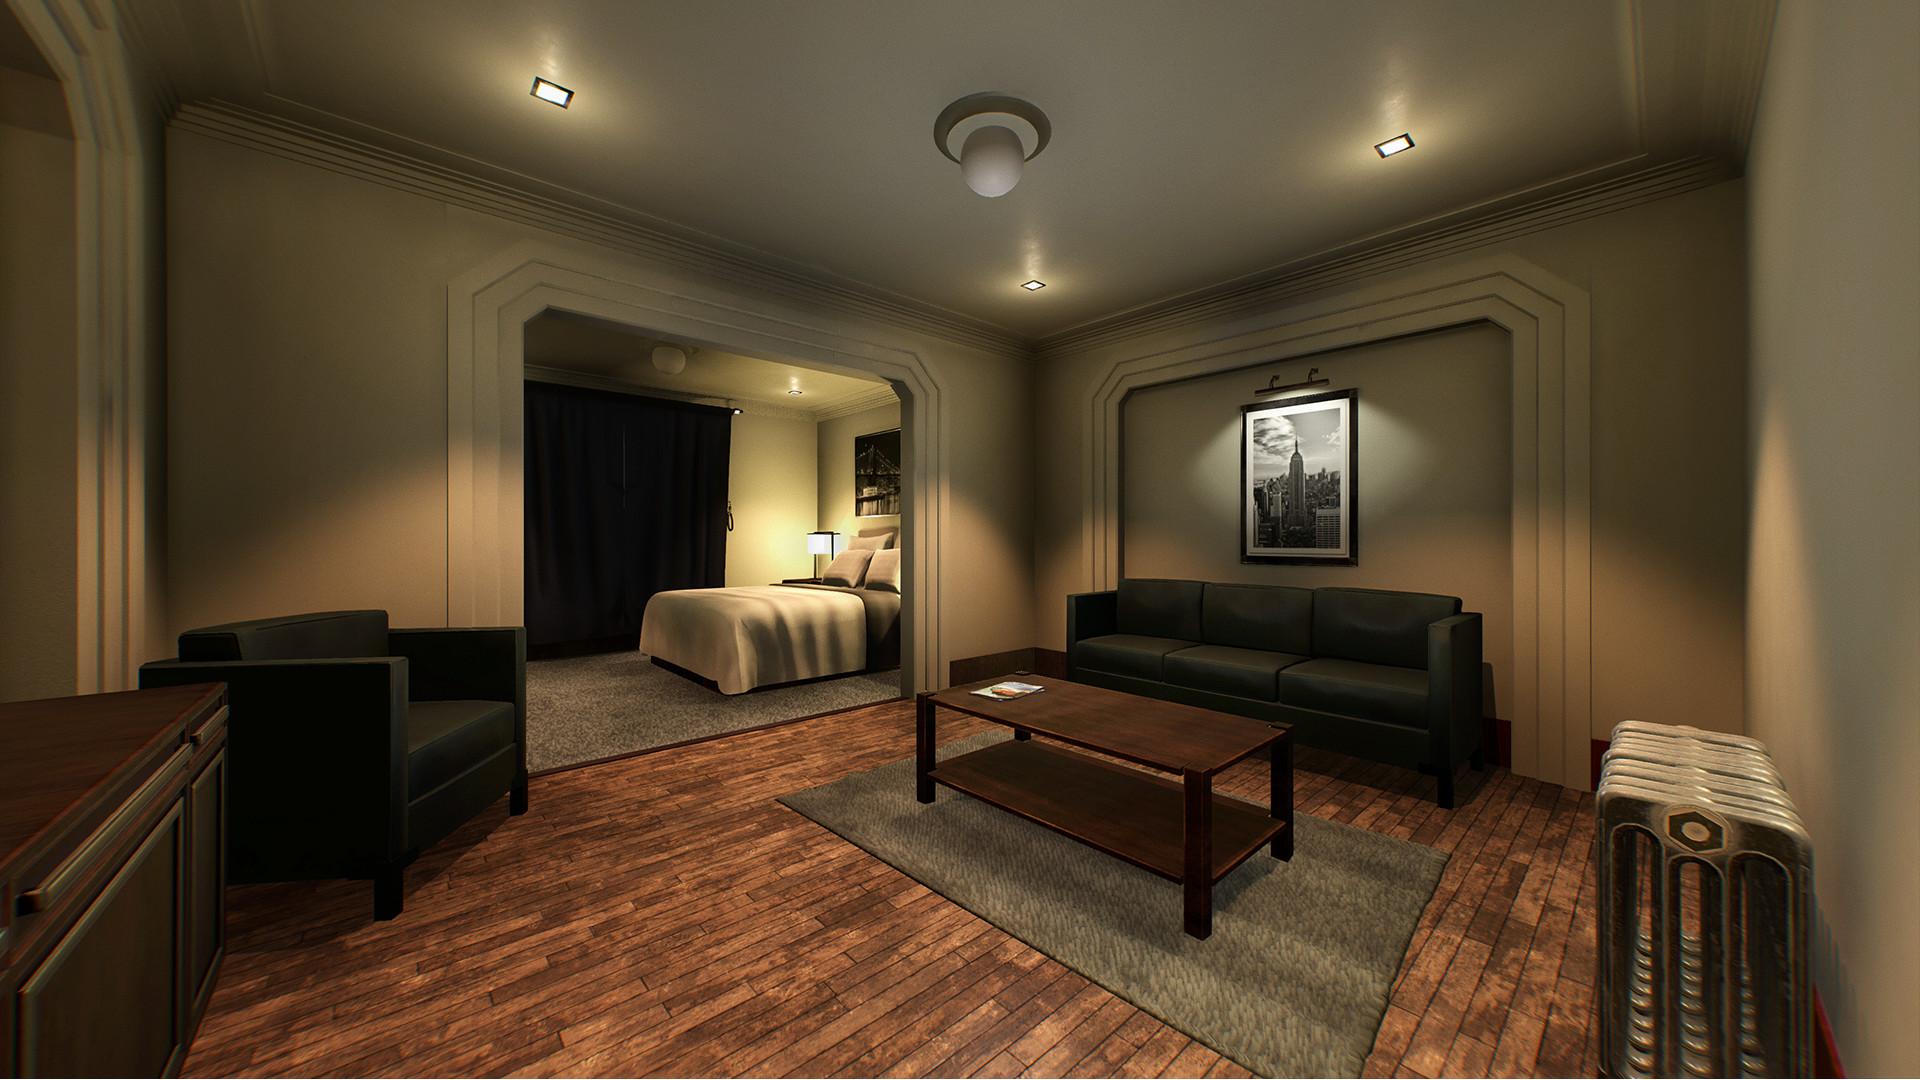 Augustin grassien bedroommodern 03